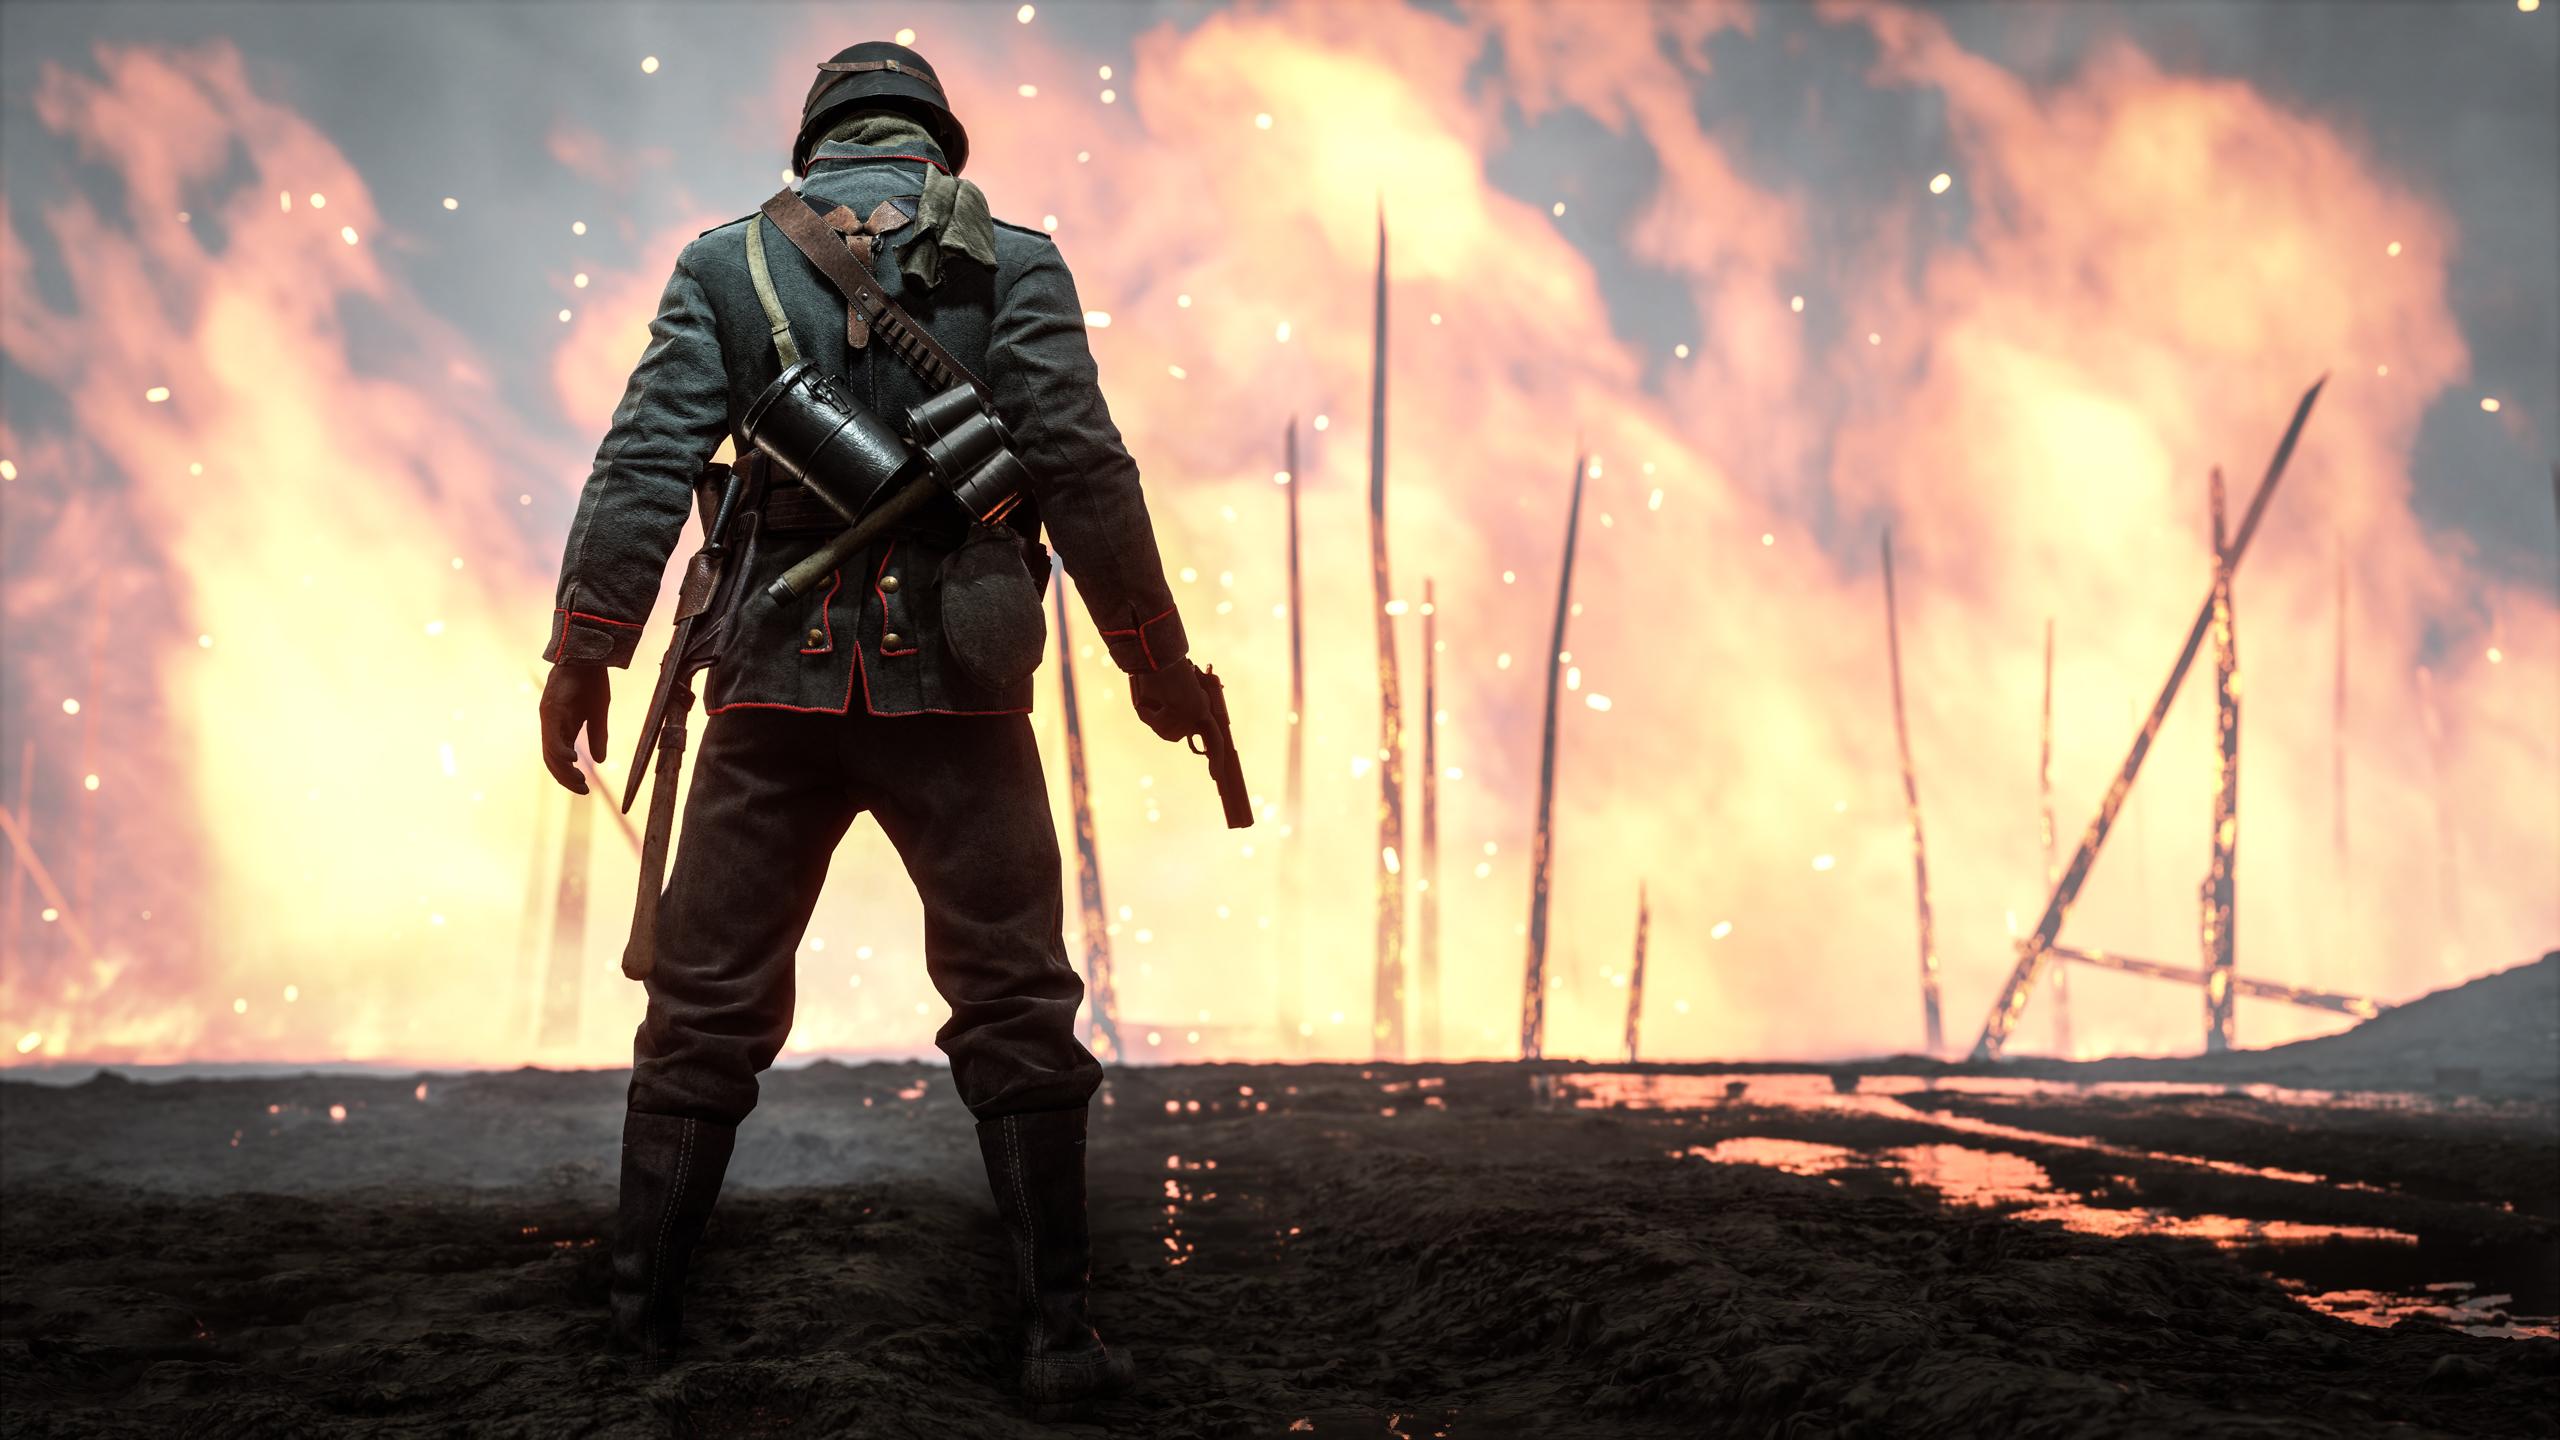 battlefield 1 high definition - photo #30